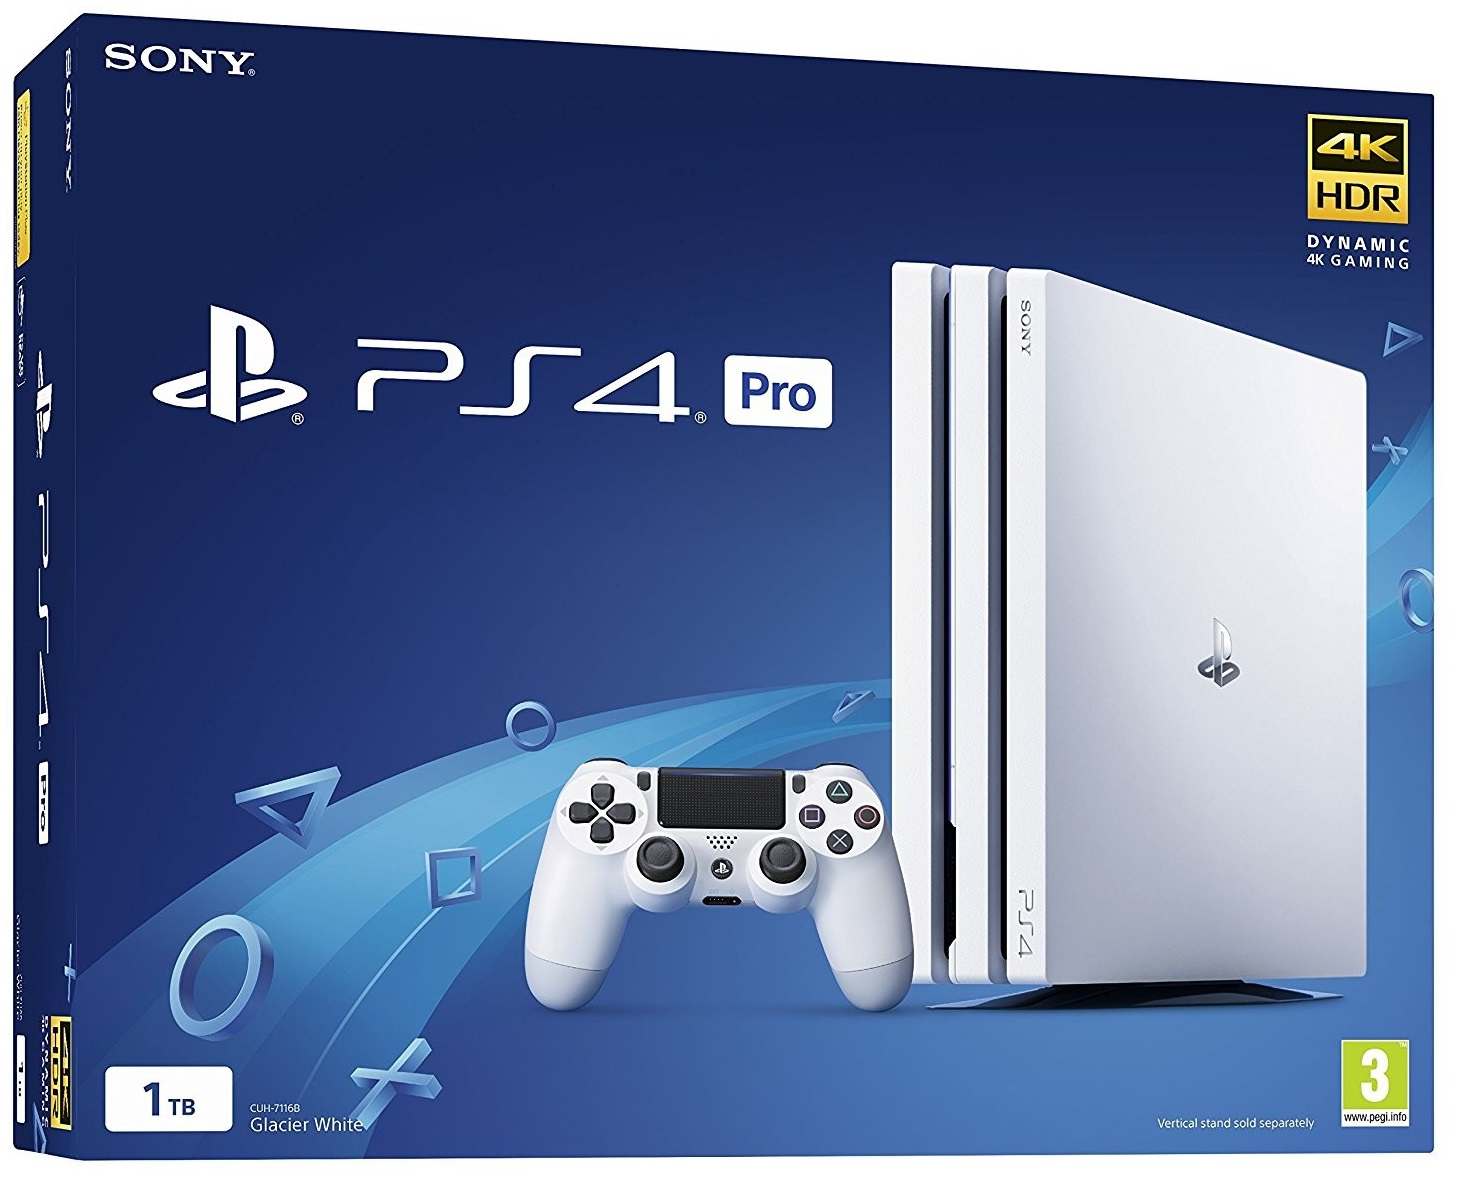 Sony Playstation 4 PRO 1TB White (CUH-7108B)